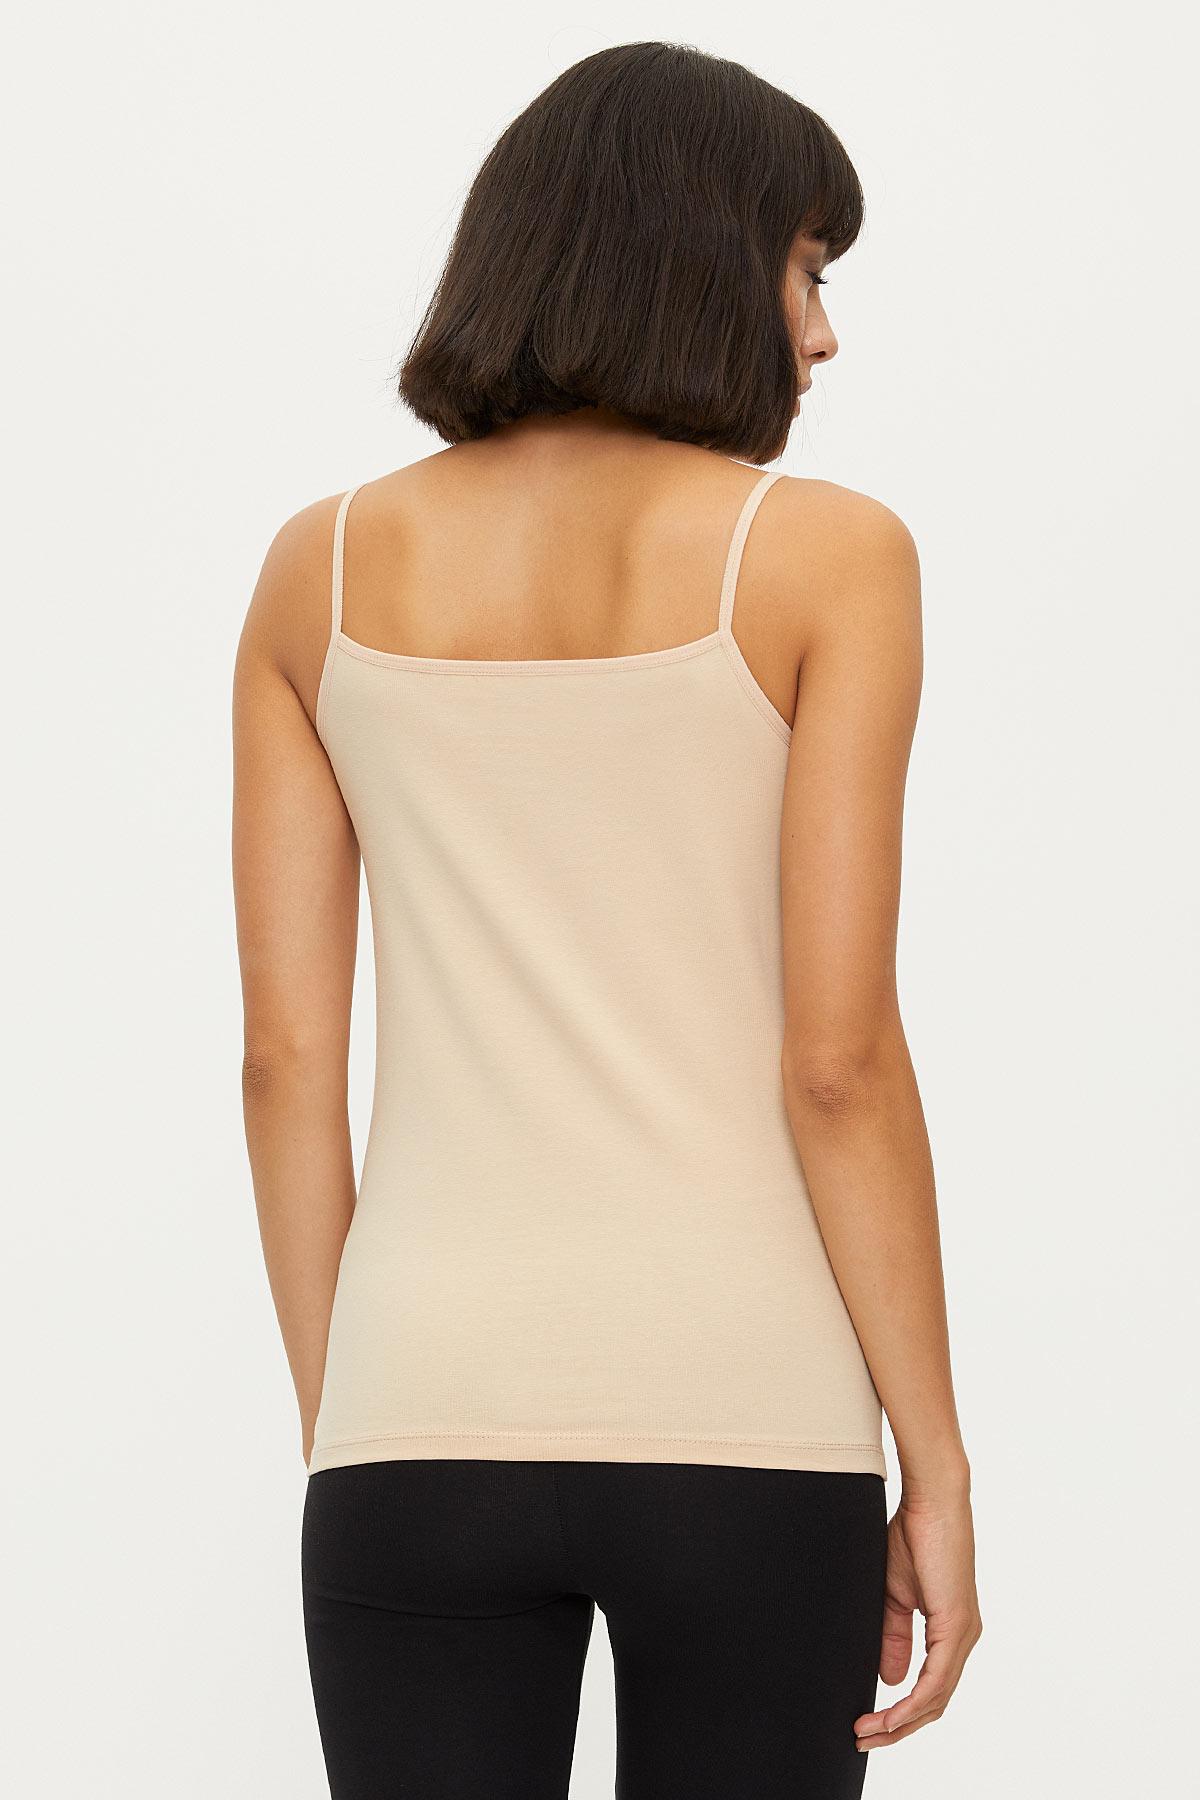 1275 Lycra Strappy Lacy Ladies Undershirt